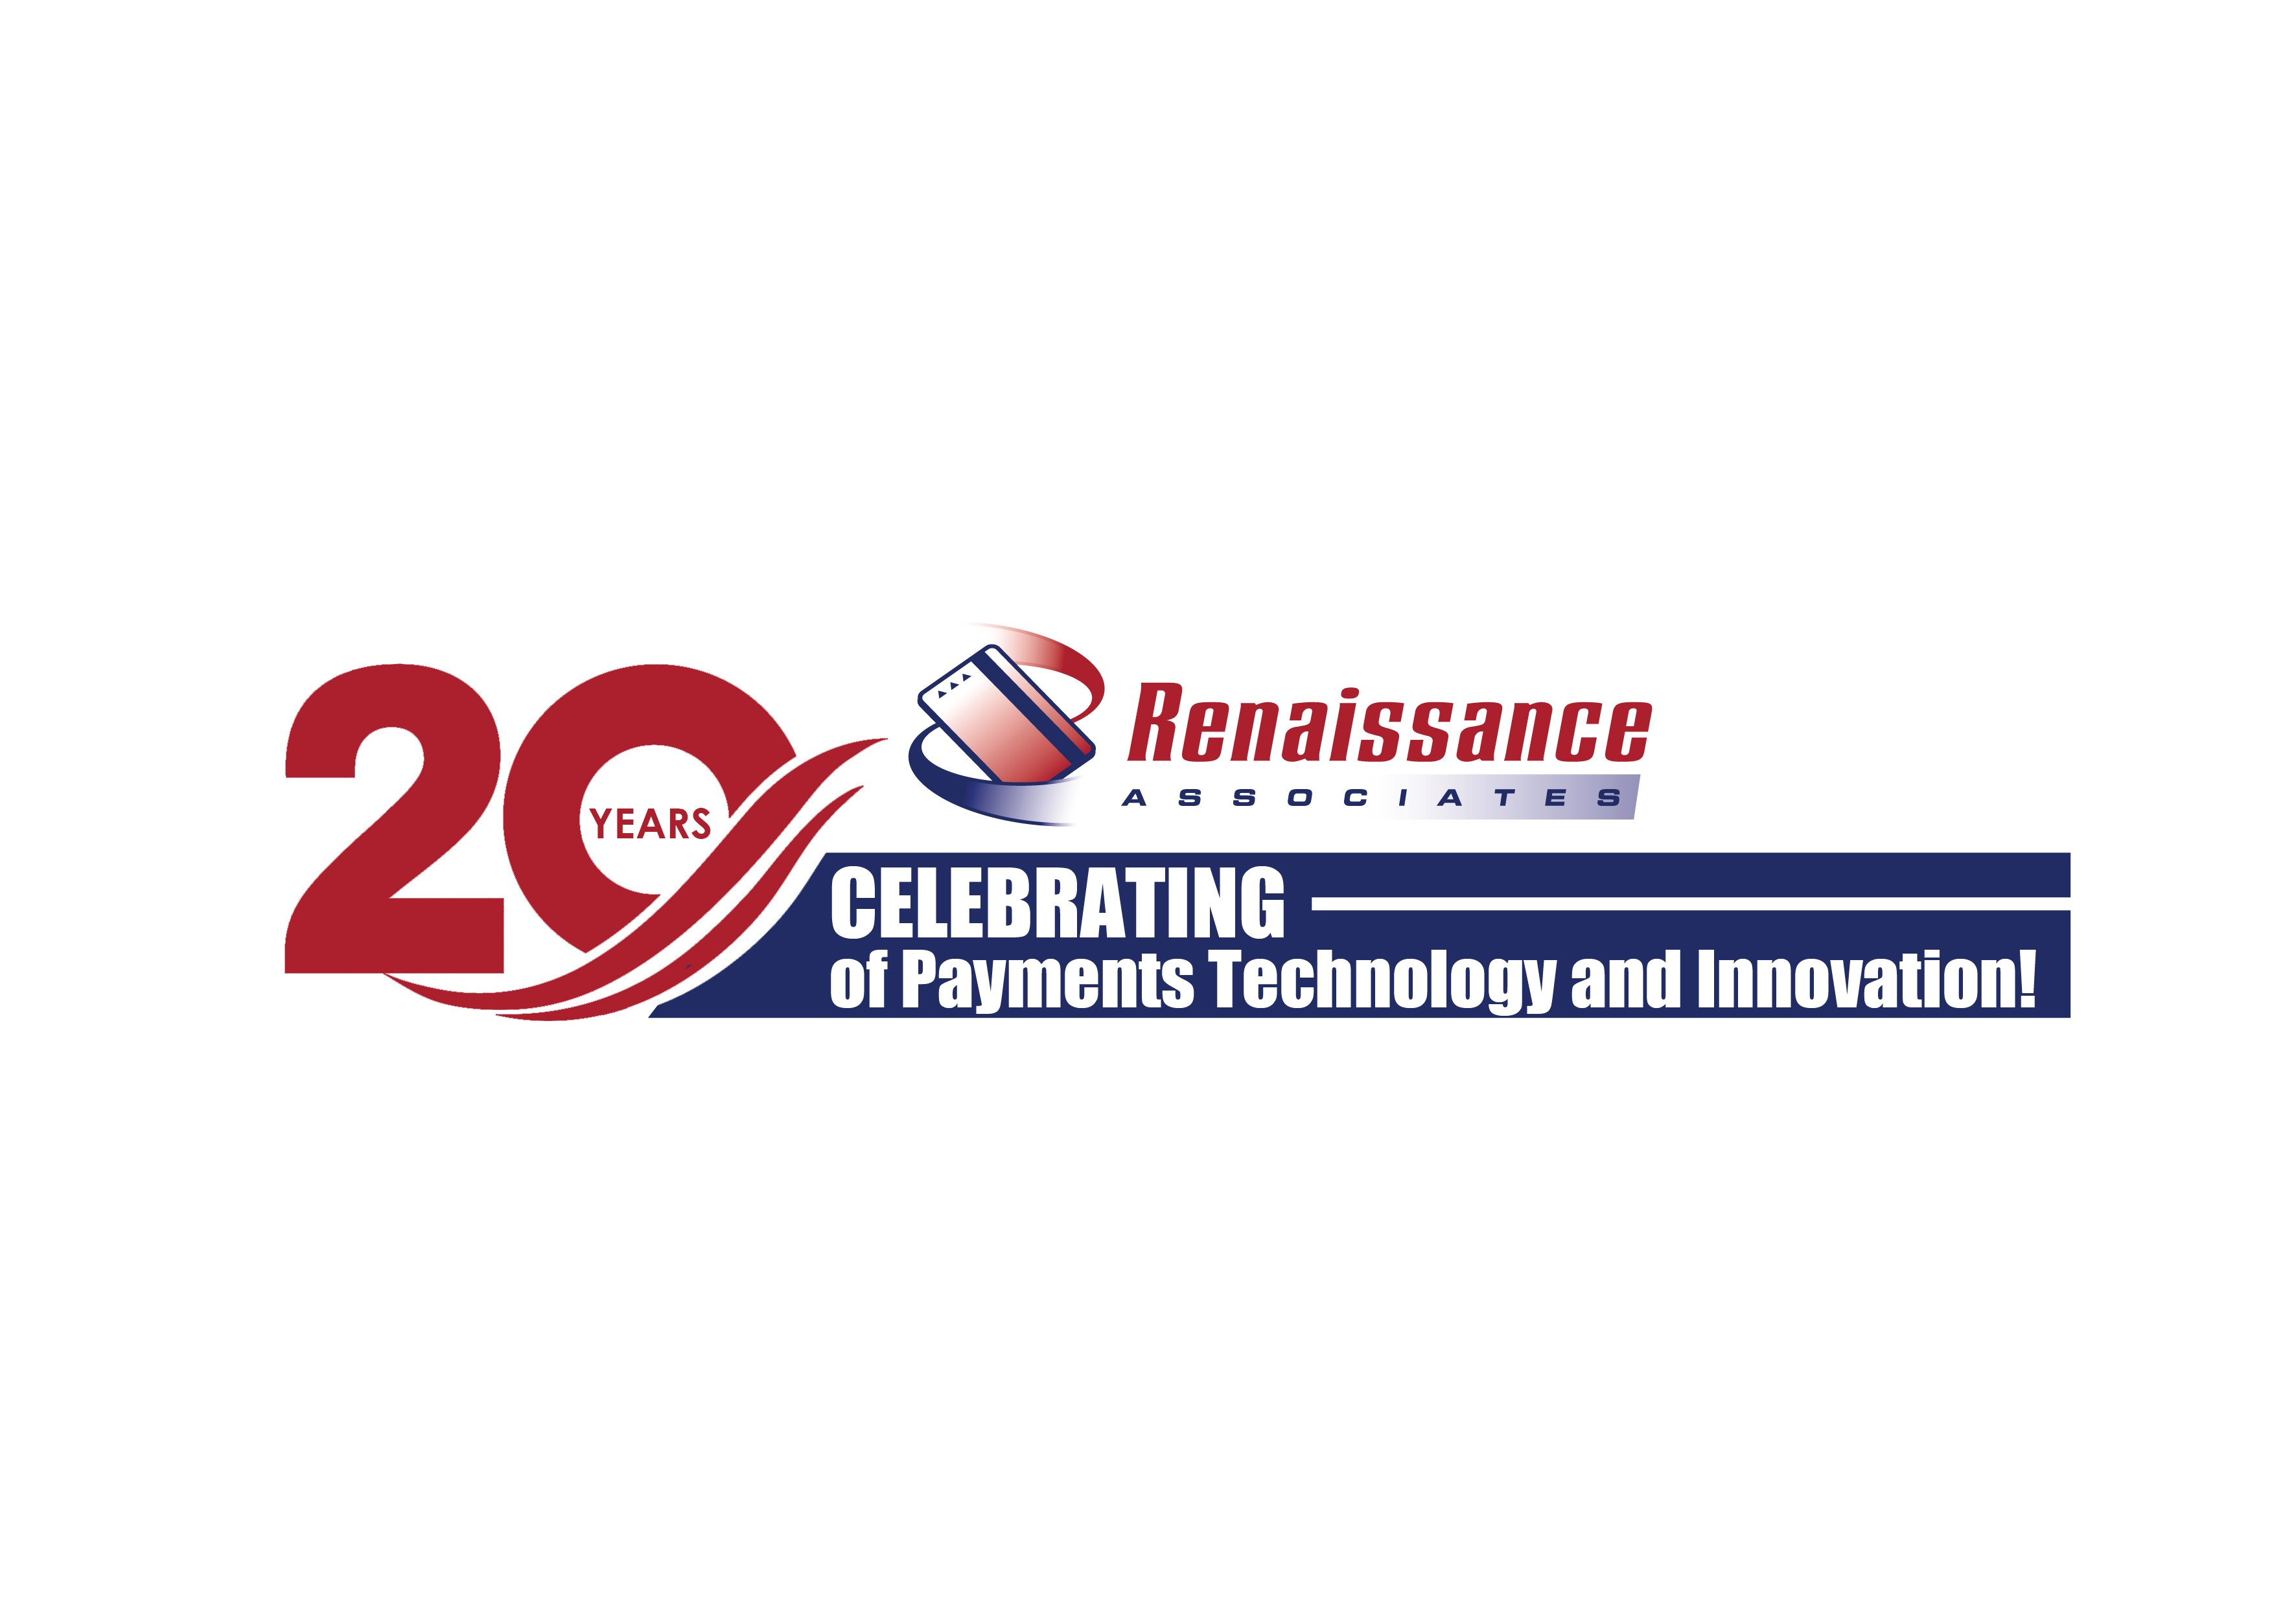 Renaissance Associates